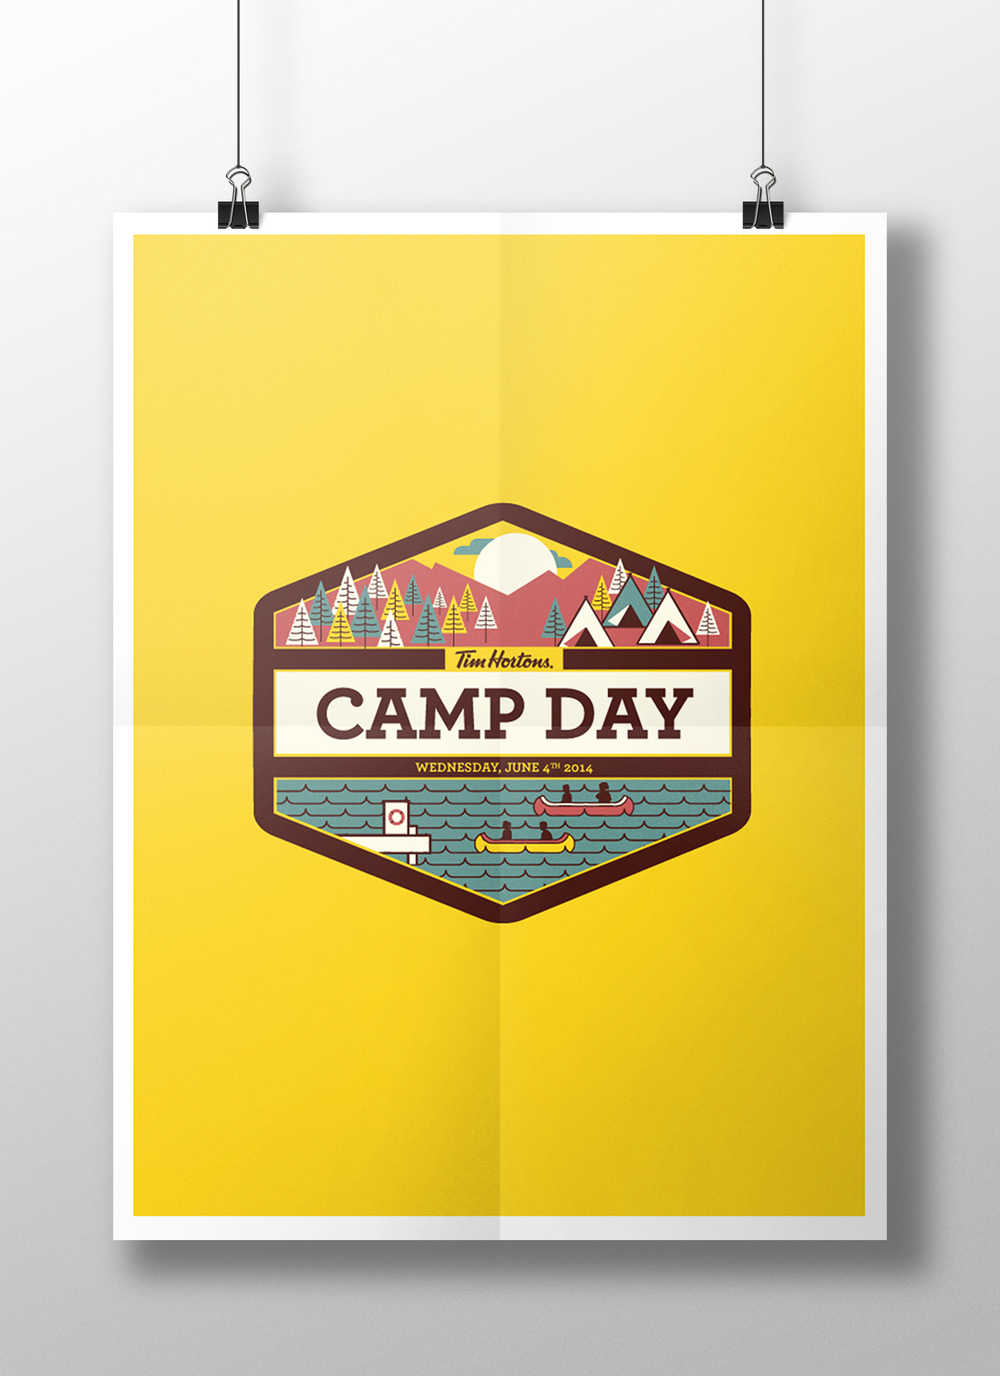 CampDay_poster_mockup.jpg